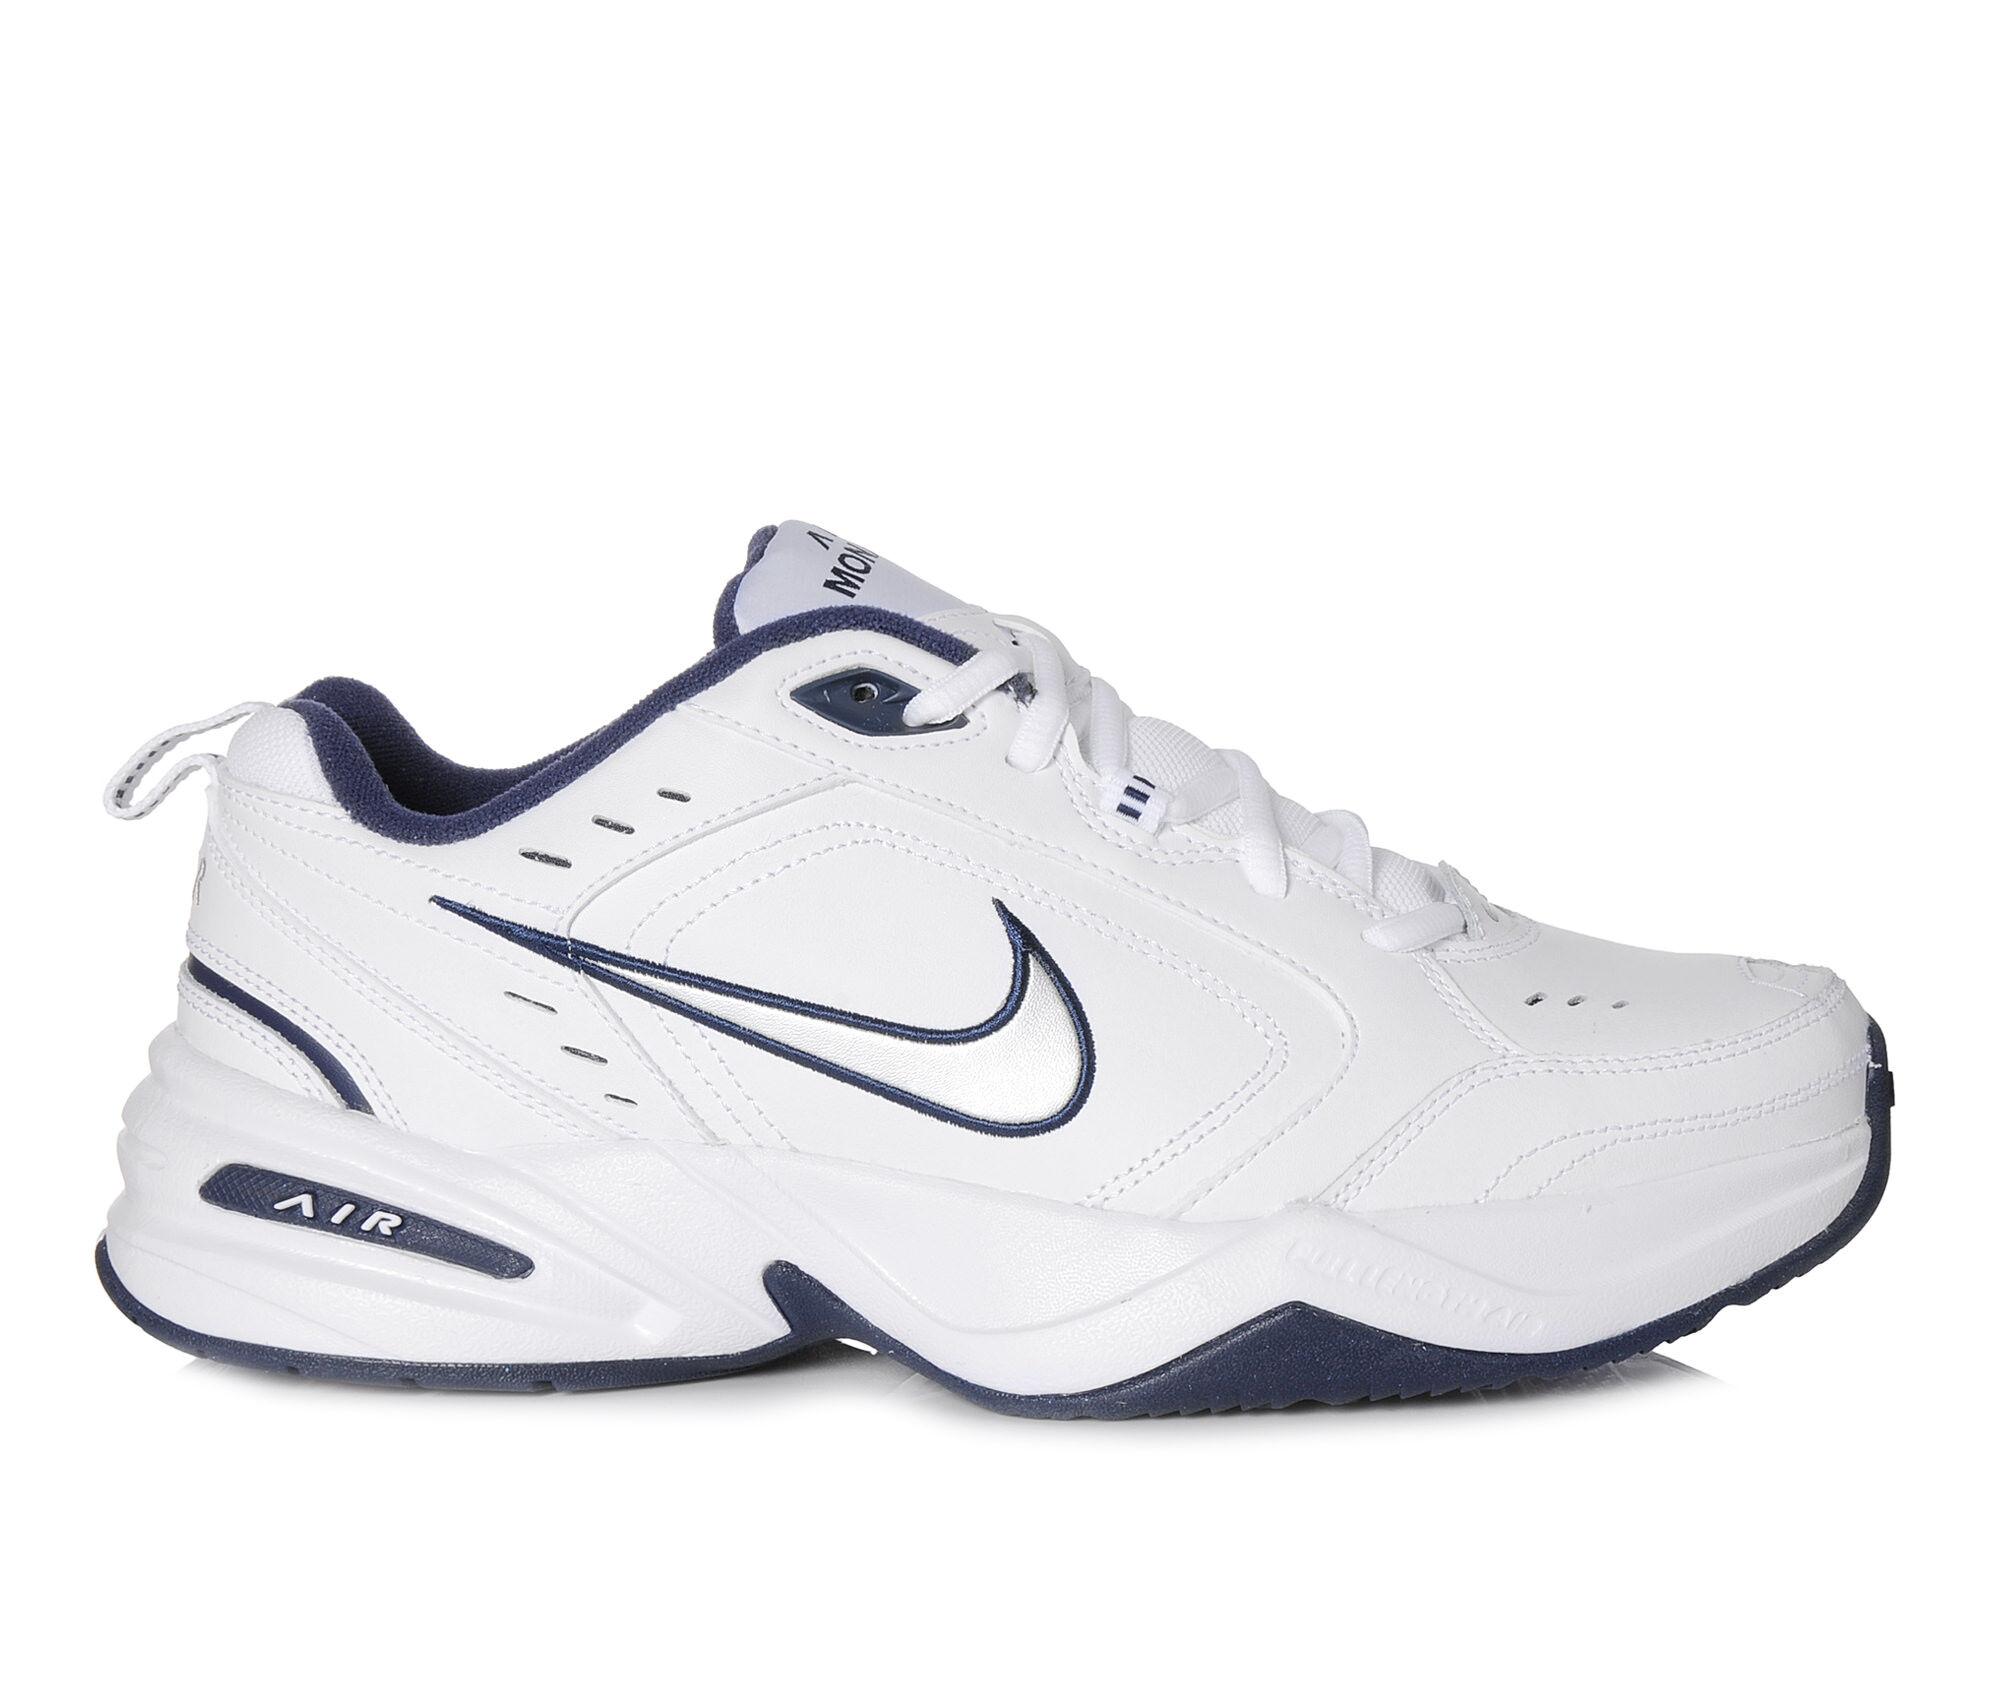 Men's Nike Air Monarch IV Training Shoes White/Sil/Navy